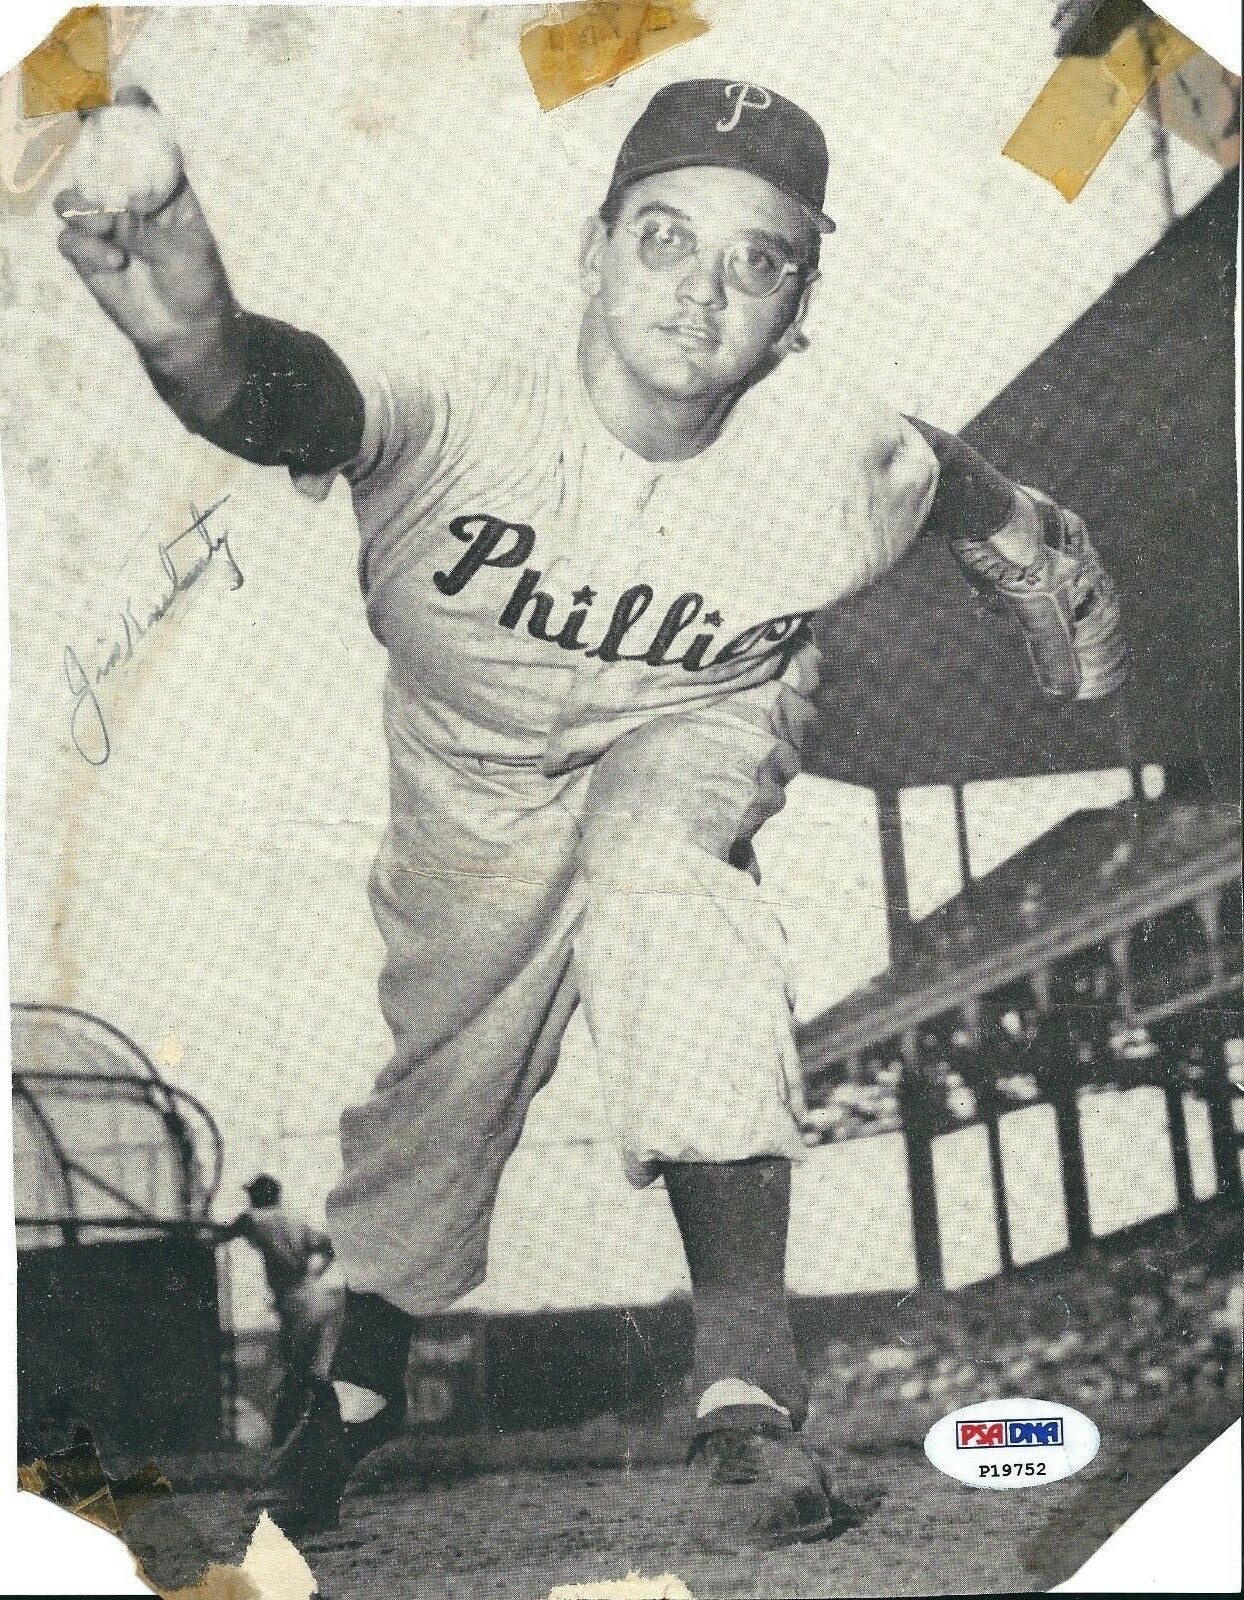 Jim Konstanty Signed Vintage Phillies Baseball Magazine Cut PSA P19752